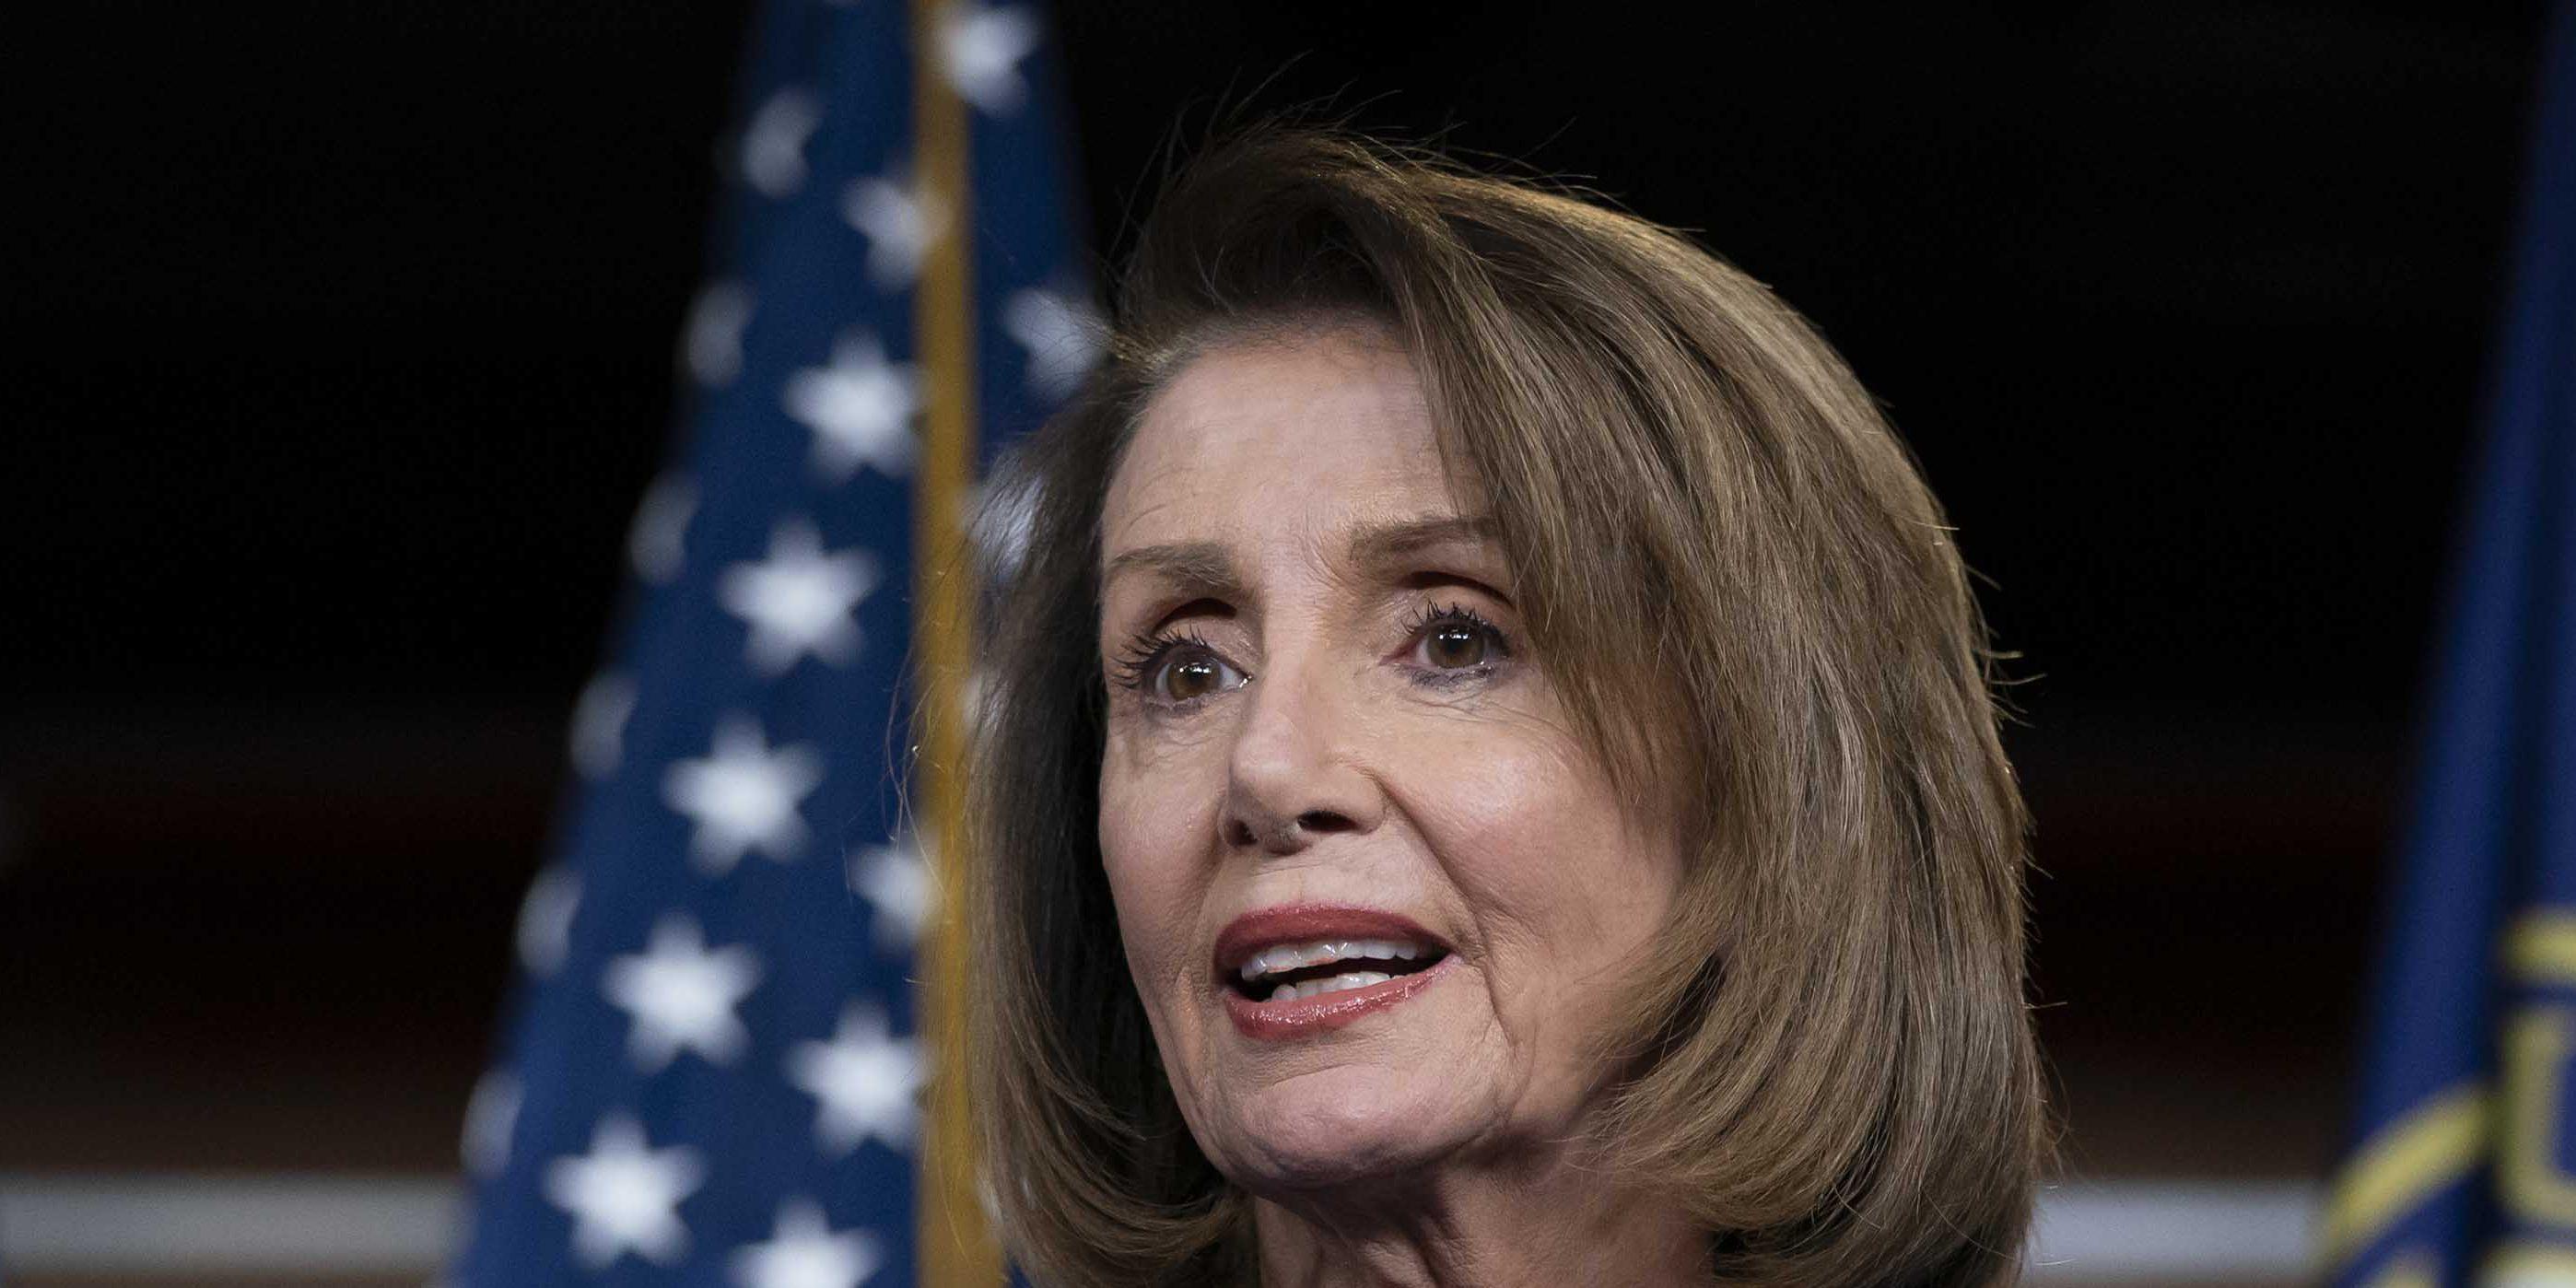 House Democrats' measure blocking Trump emergency declaration coming Friday